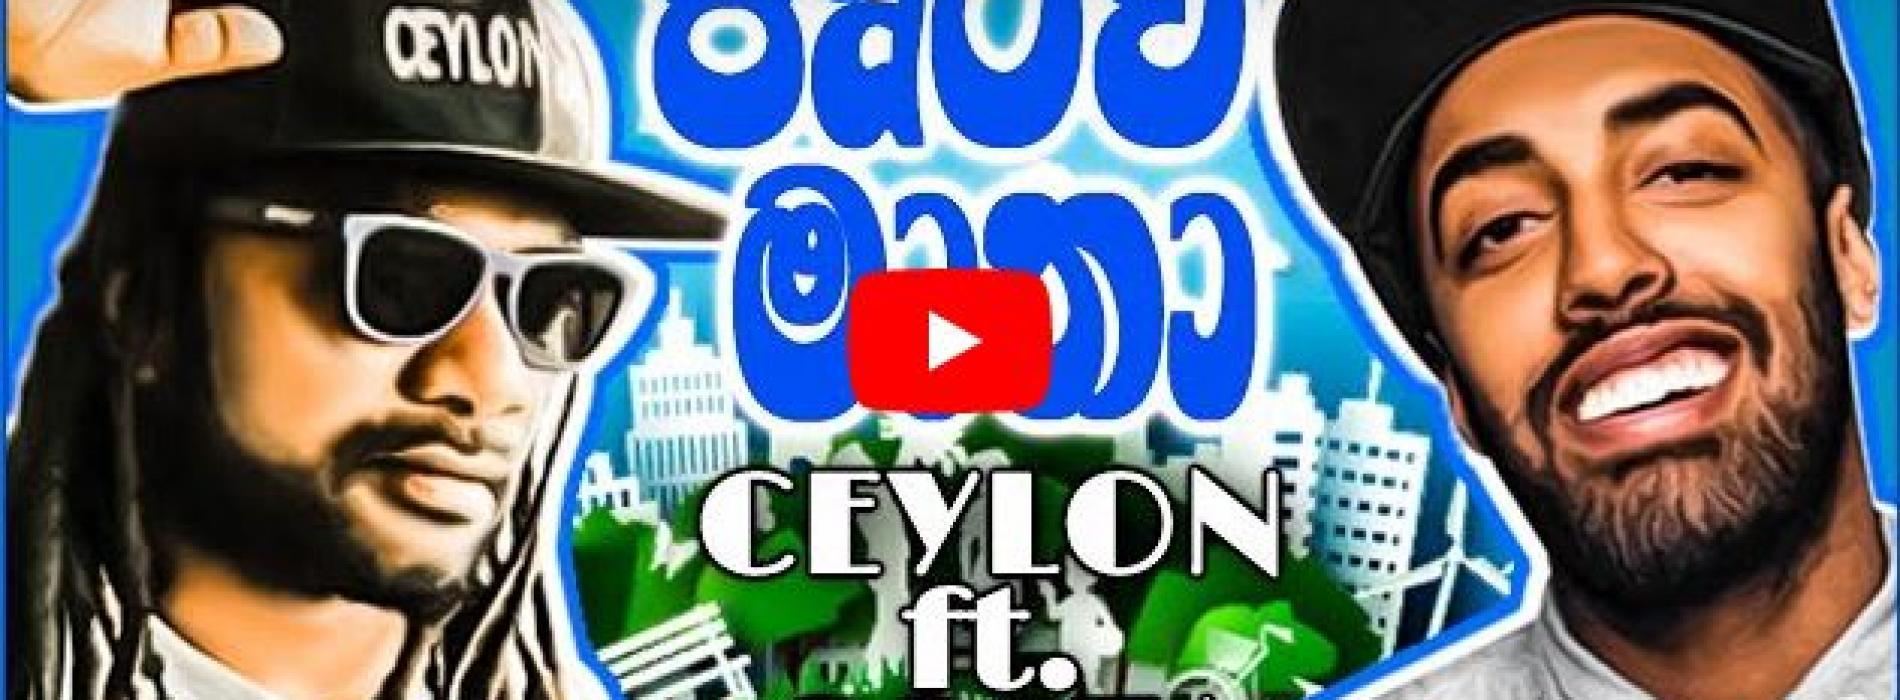 New Music : Pruthuvi Matha – Costa Ft Ceylon (Official Lyrics Music Video)